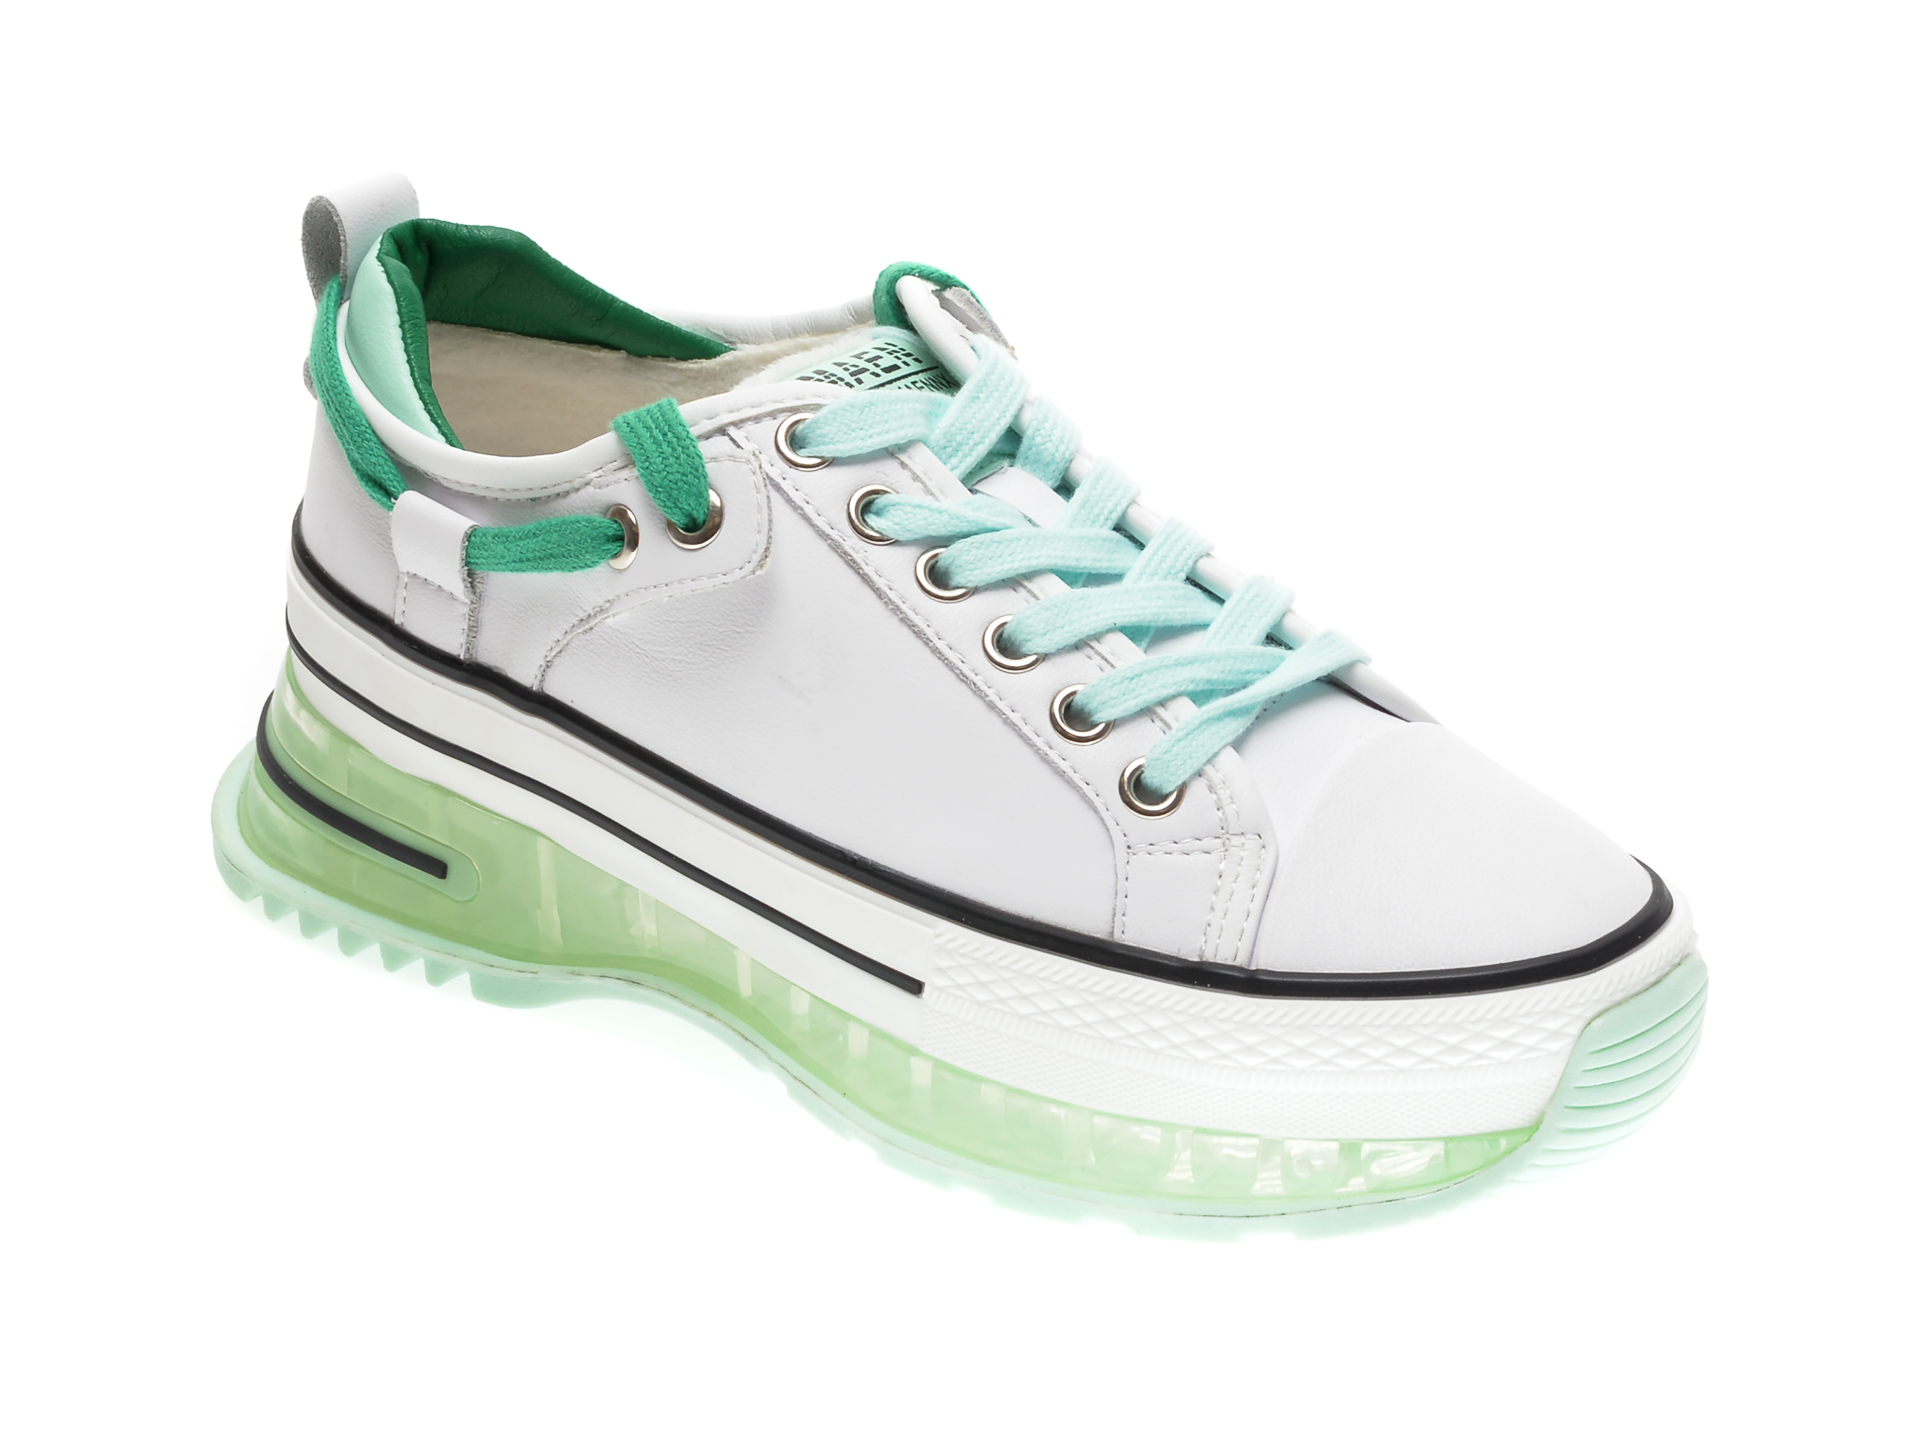 Pantofi sport GRYXX albi, 20208, din piele naturala